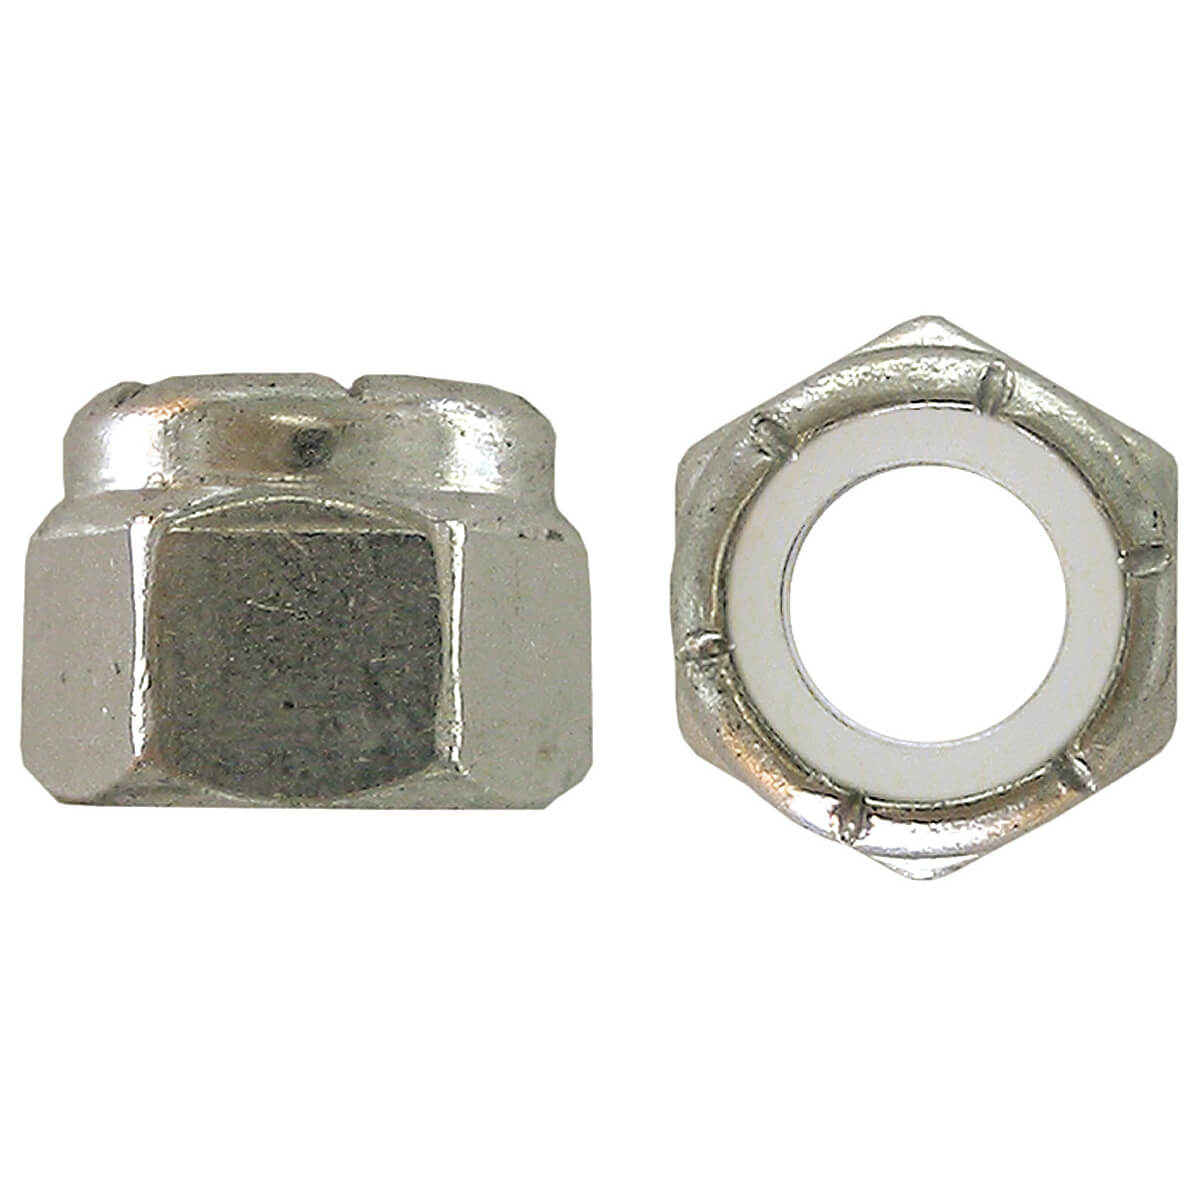 Nylon Insert Stop Nut-Pozi-Lok-Zinc Plated - 3/4-in-10 - 20 Piece